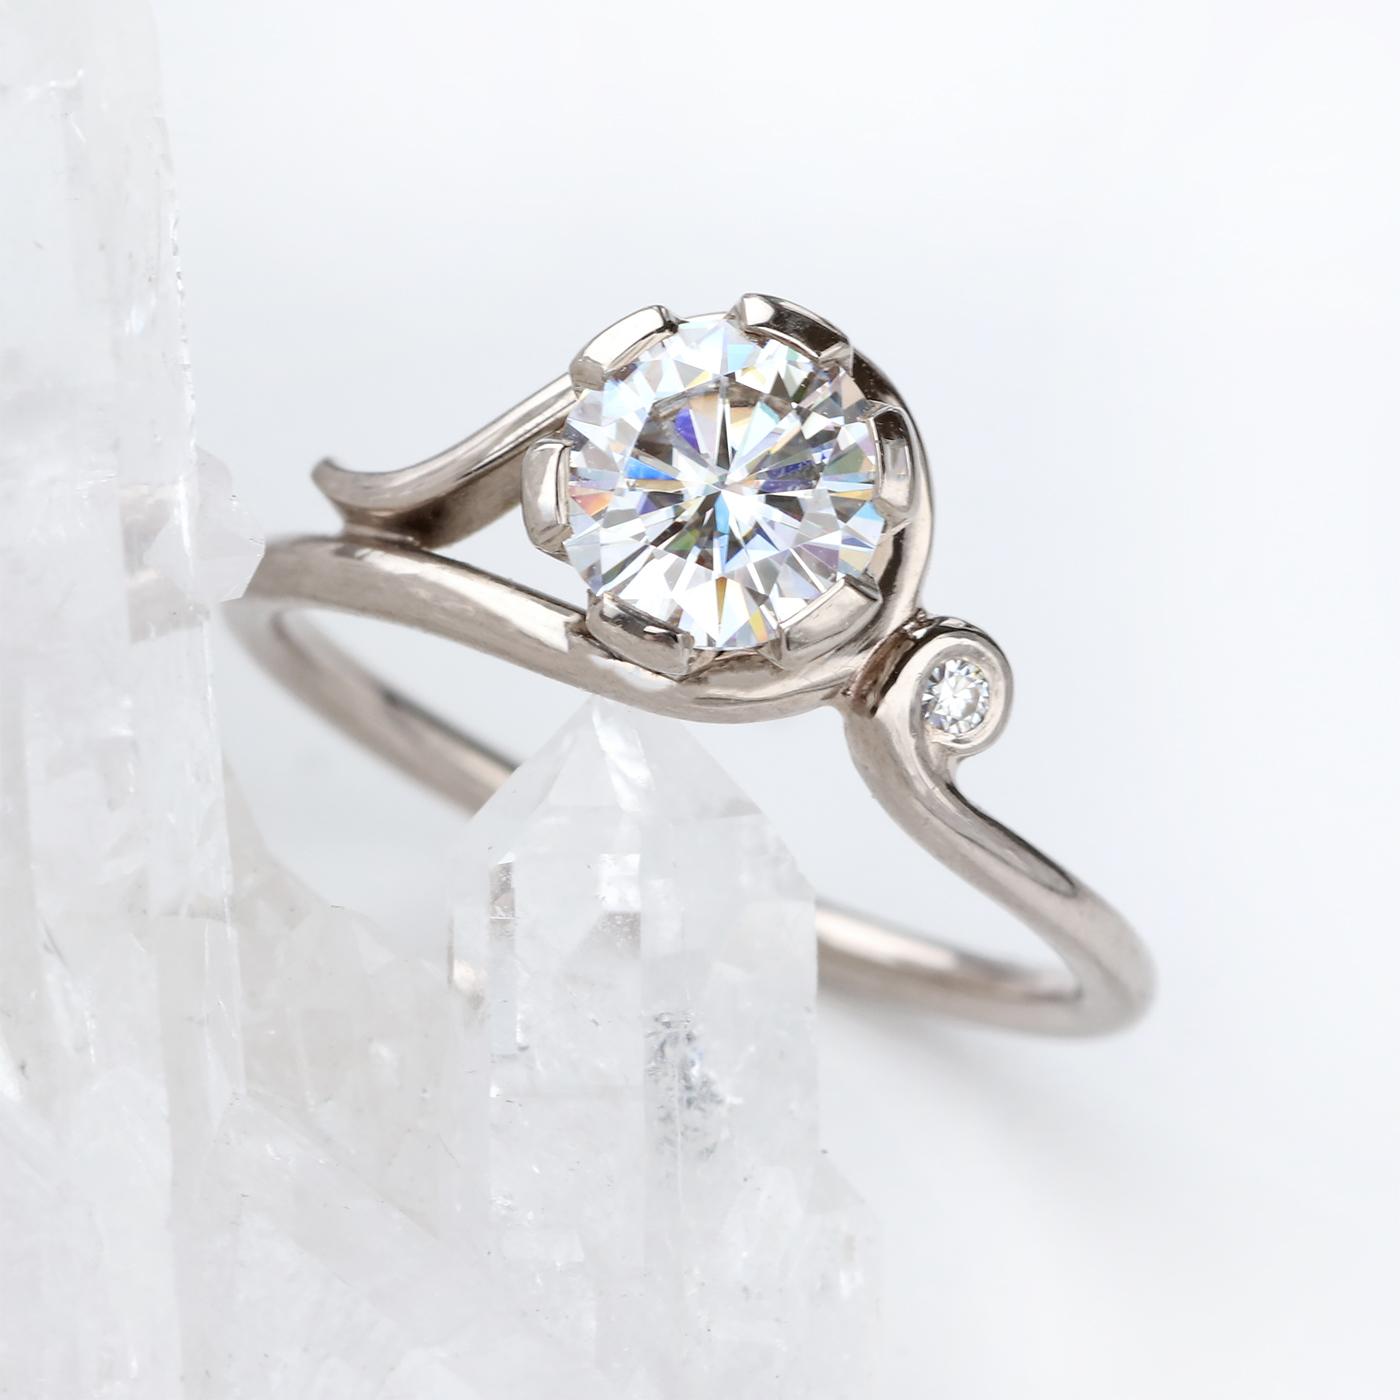 082fb8e6055cce Moissanite Art Nouveau Inspired Ring (Gold or Platinum) – Lilia Nash